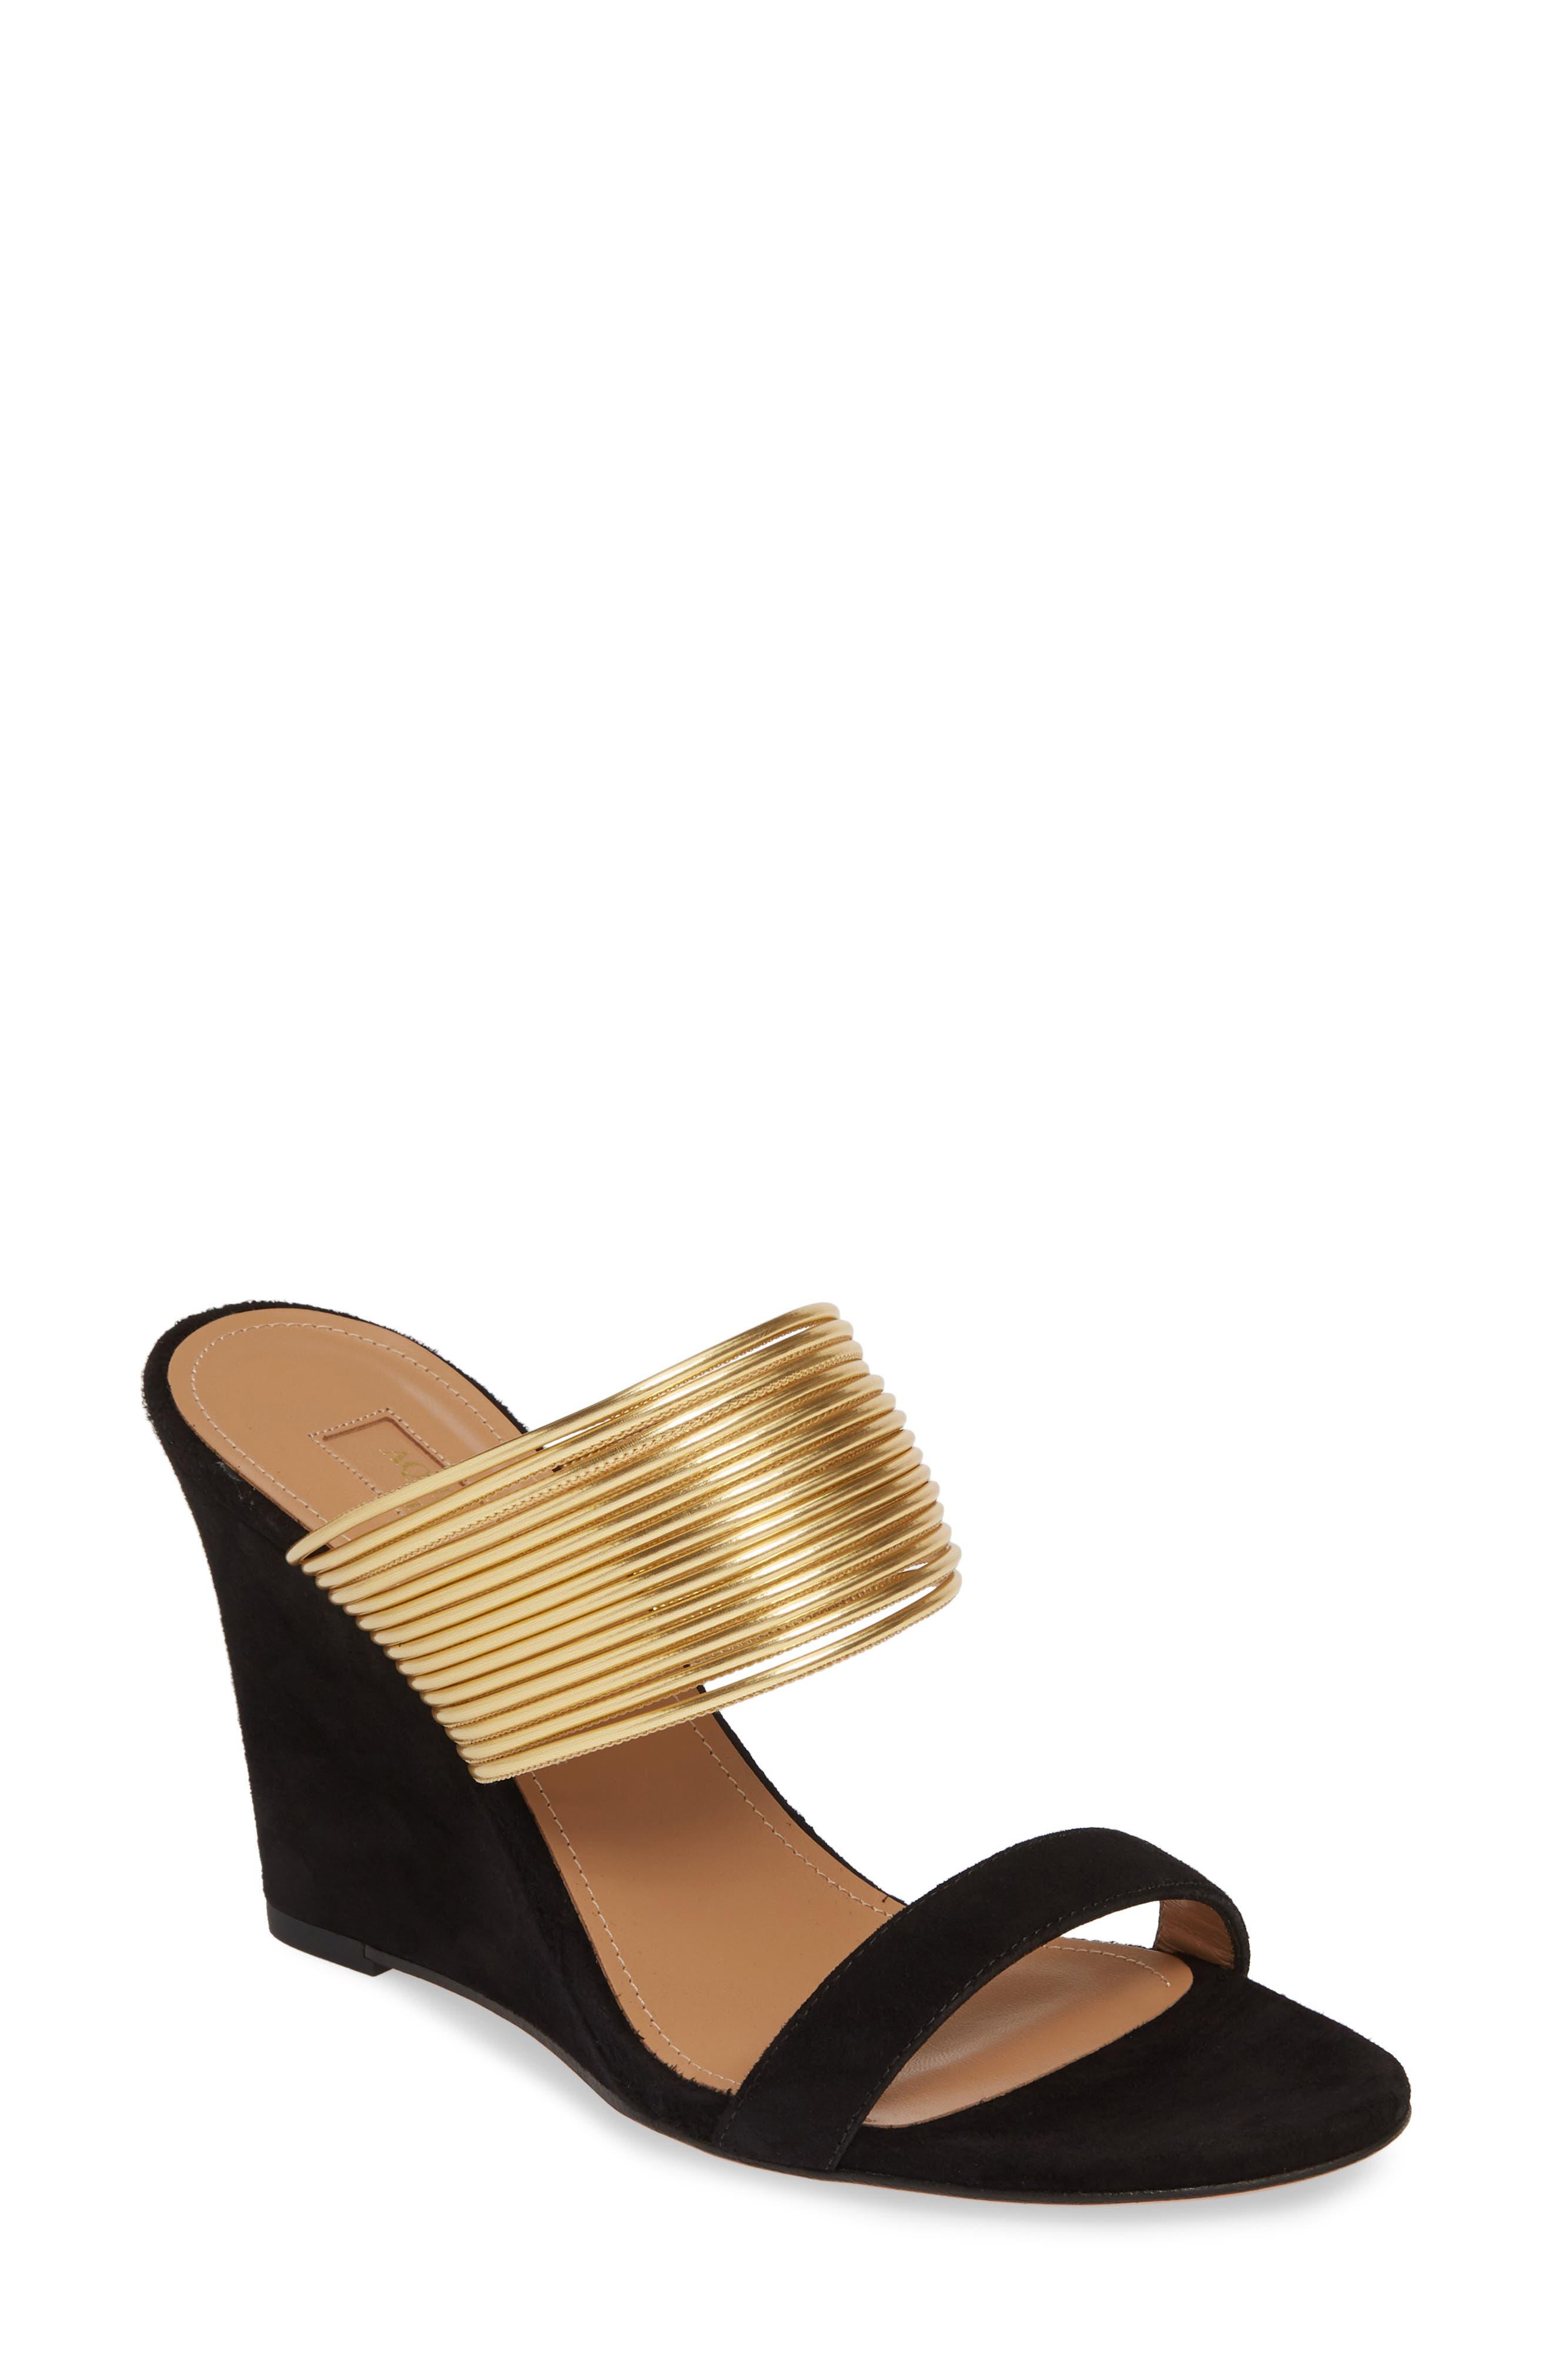 Aquazzura Slippers Rendez Vous Wedge Slide Sandal